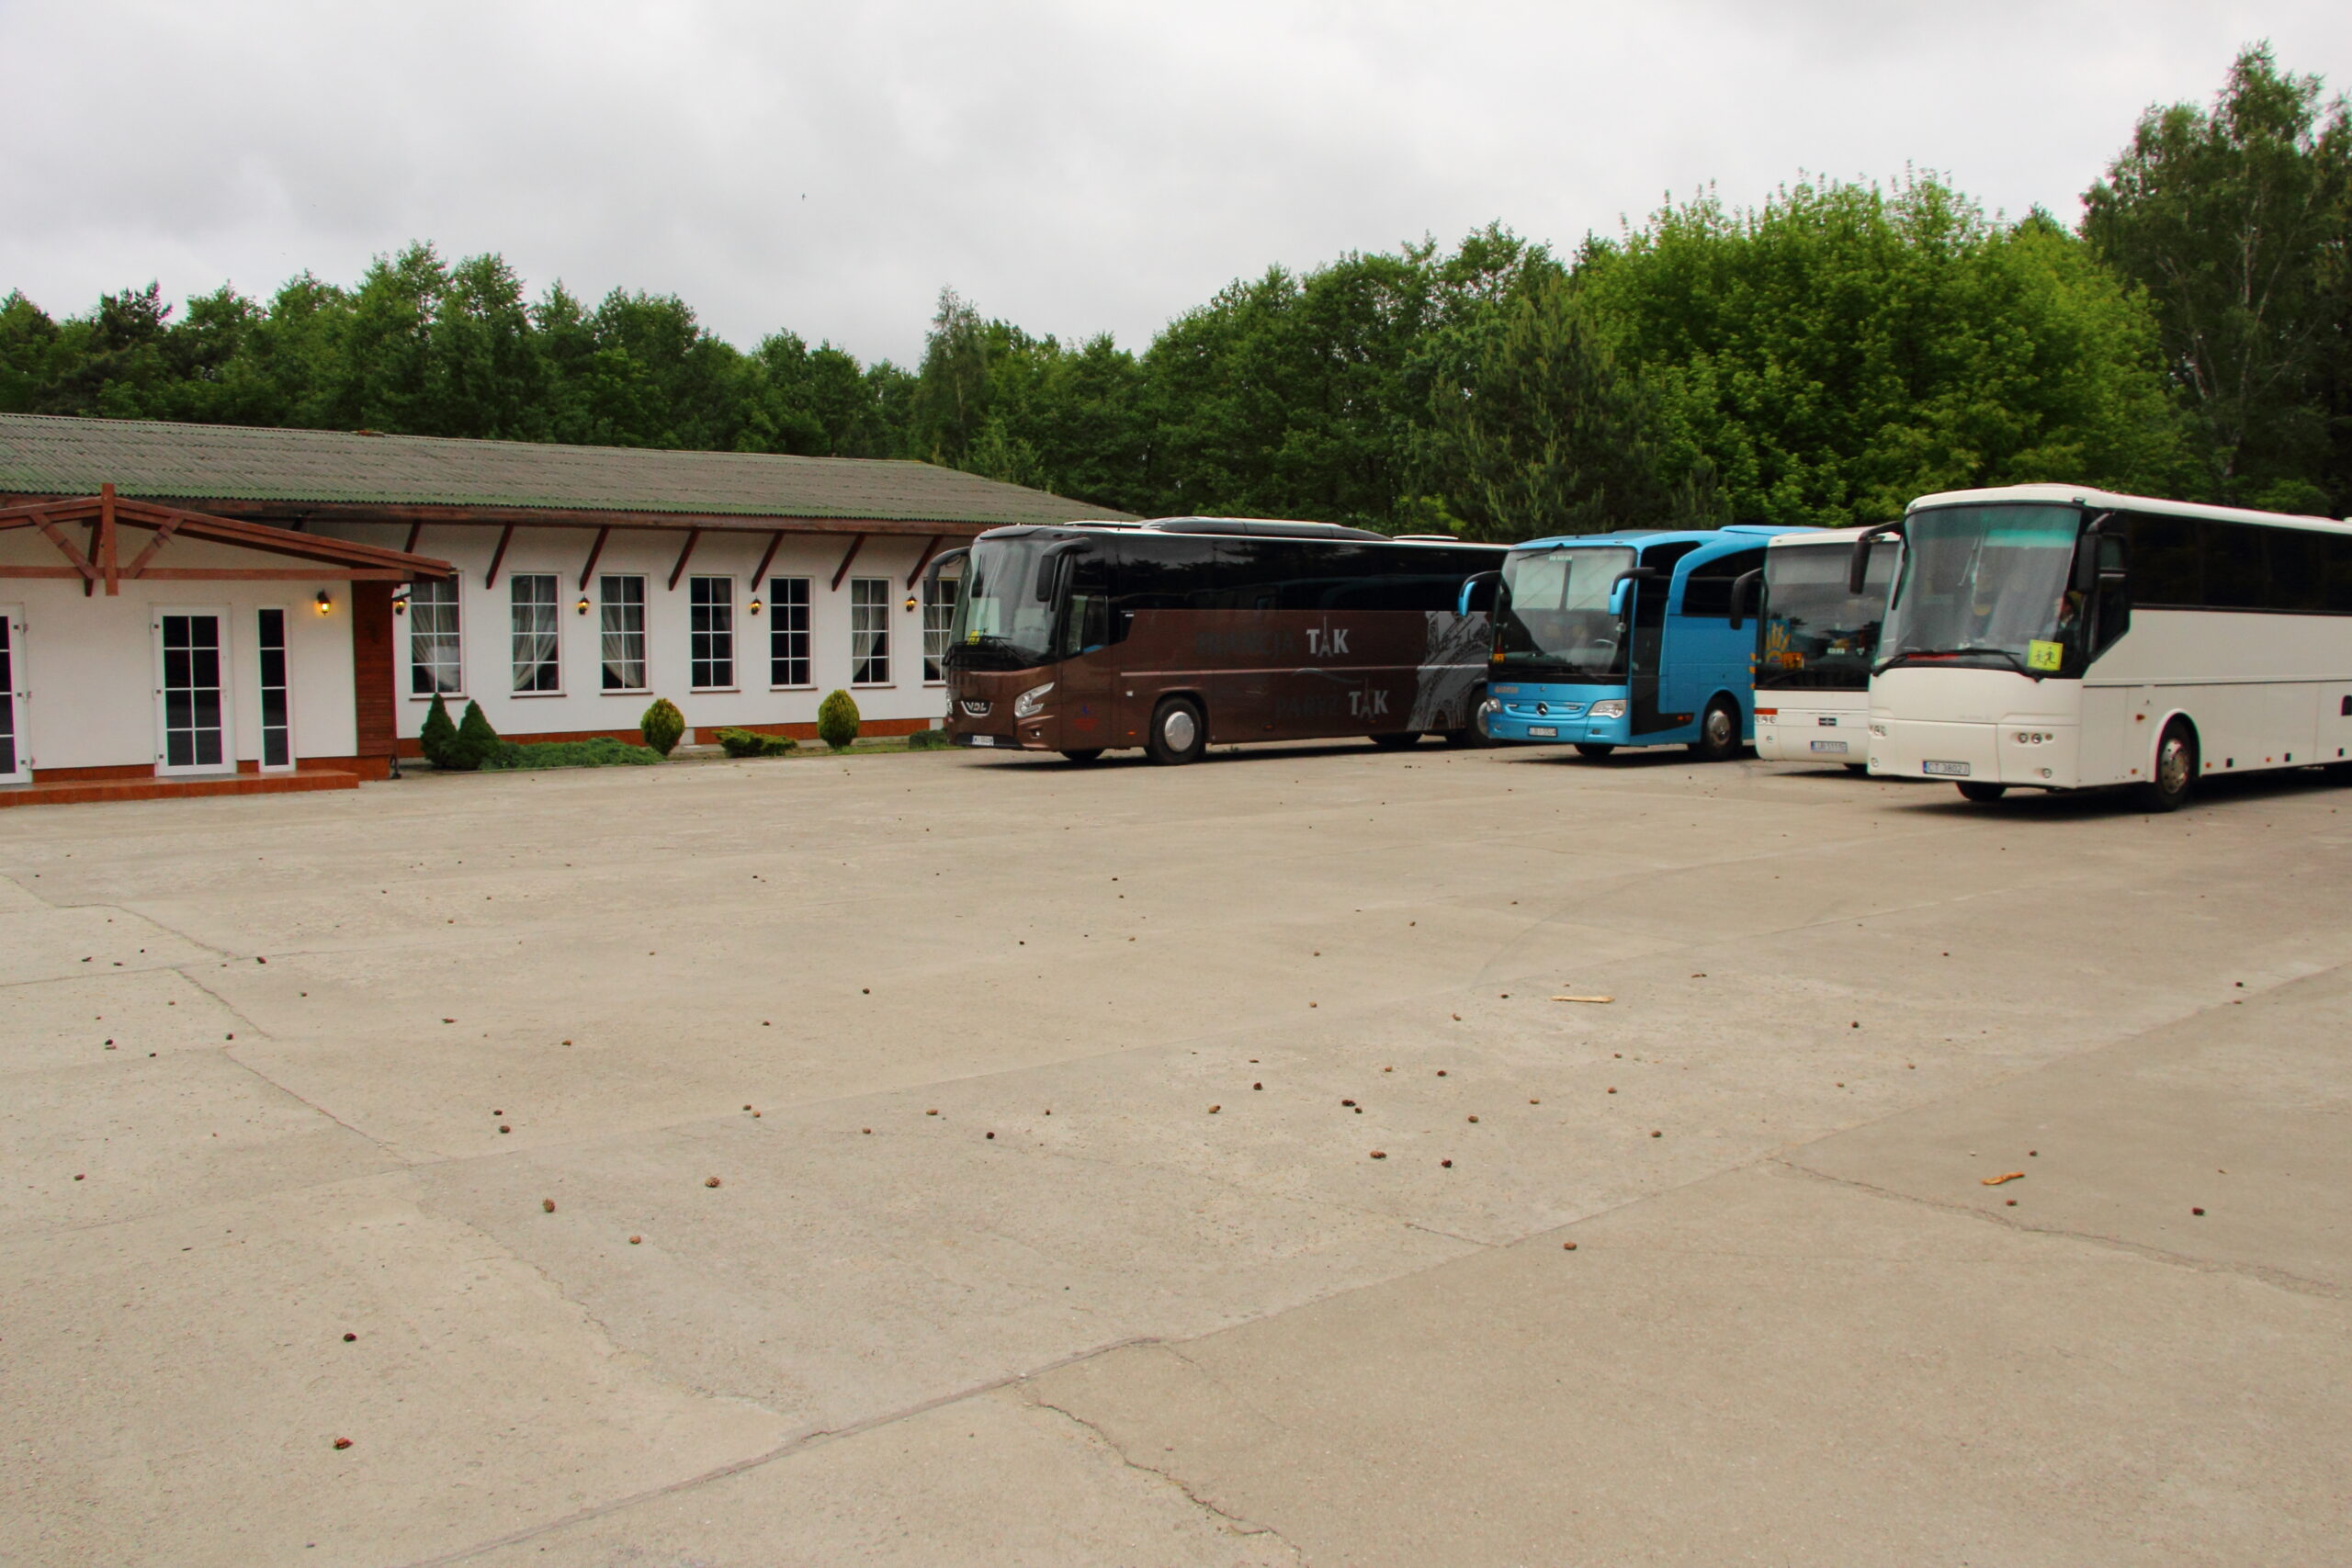 Alma_parking